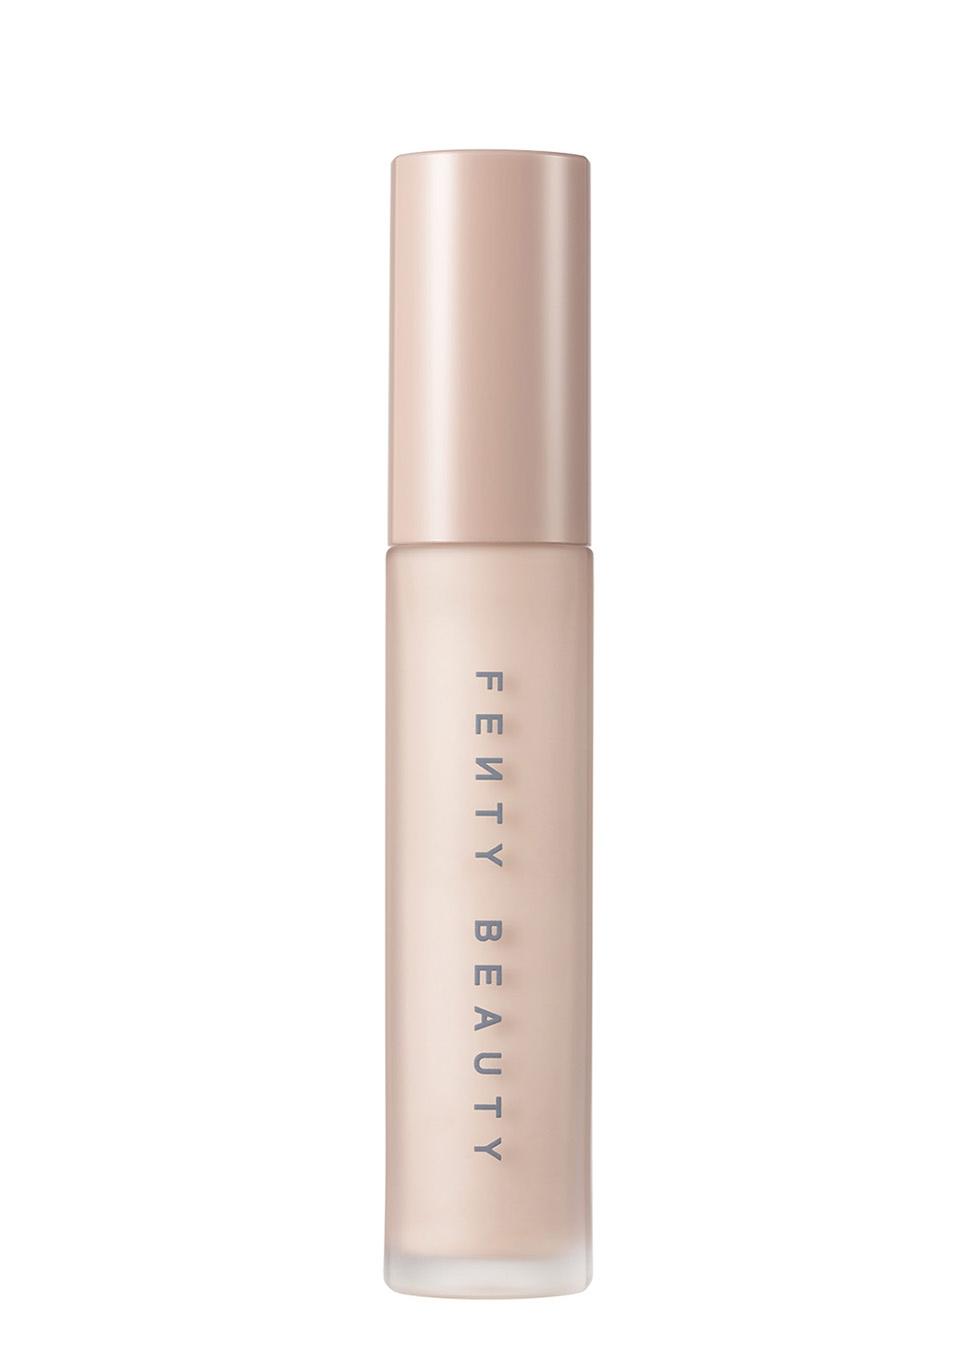 Rihanna Fenty Beauty Pro Filt'r Amplifying Eye Primer